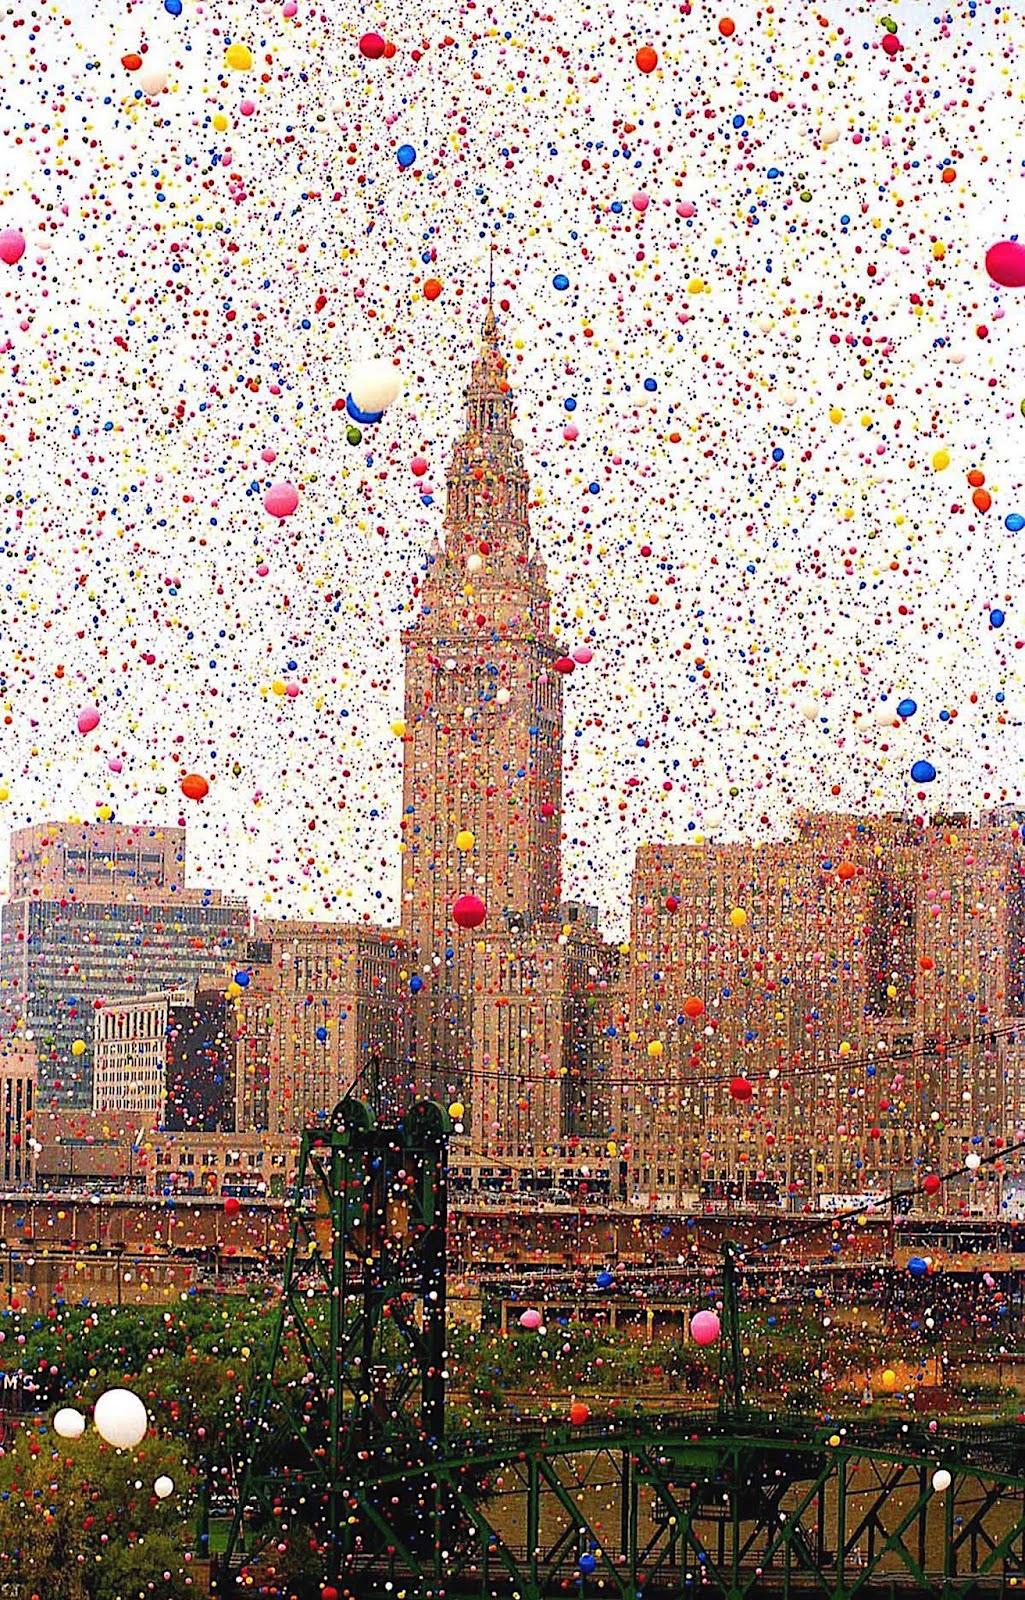 Cleveland 1986 balloons photograph